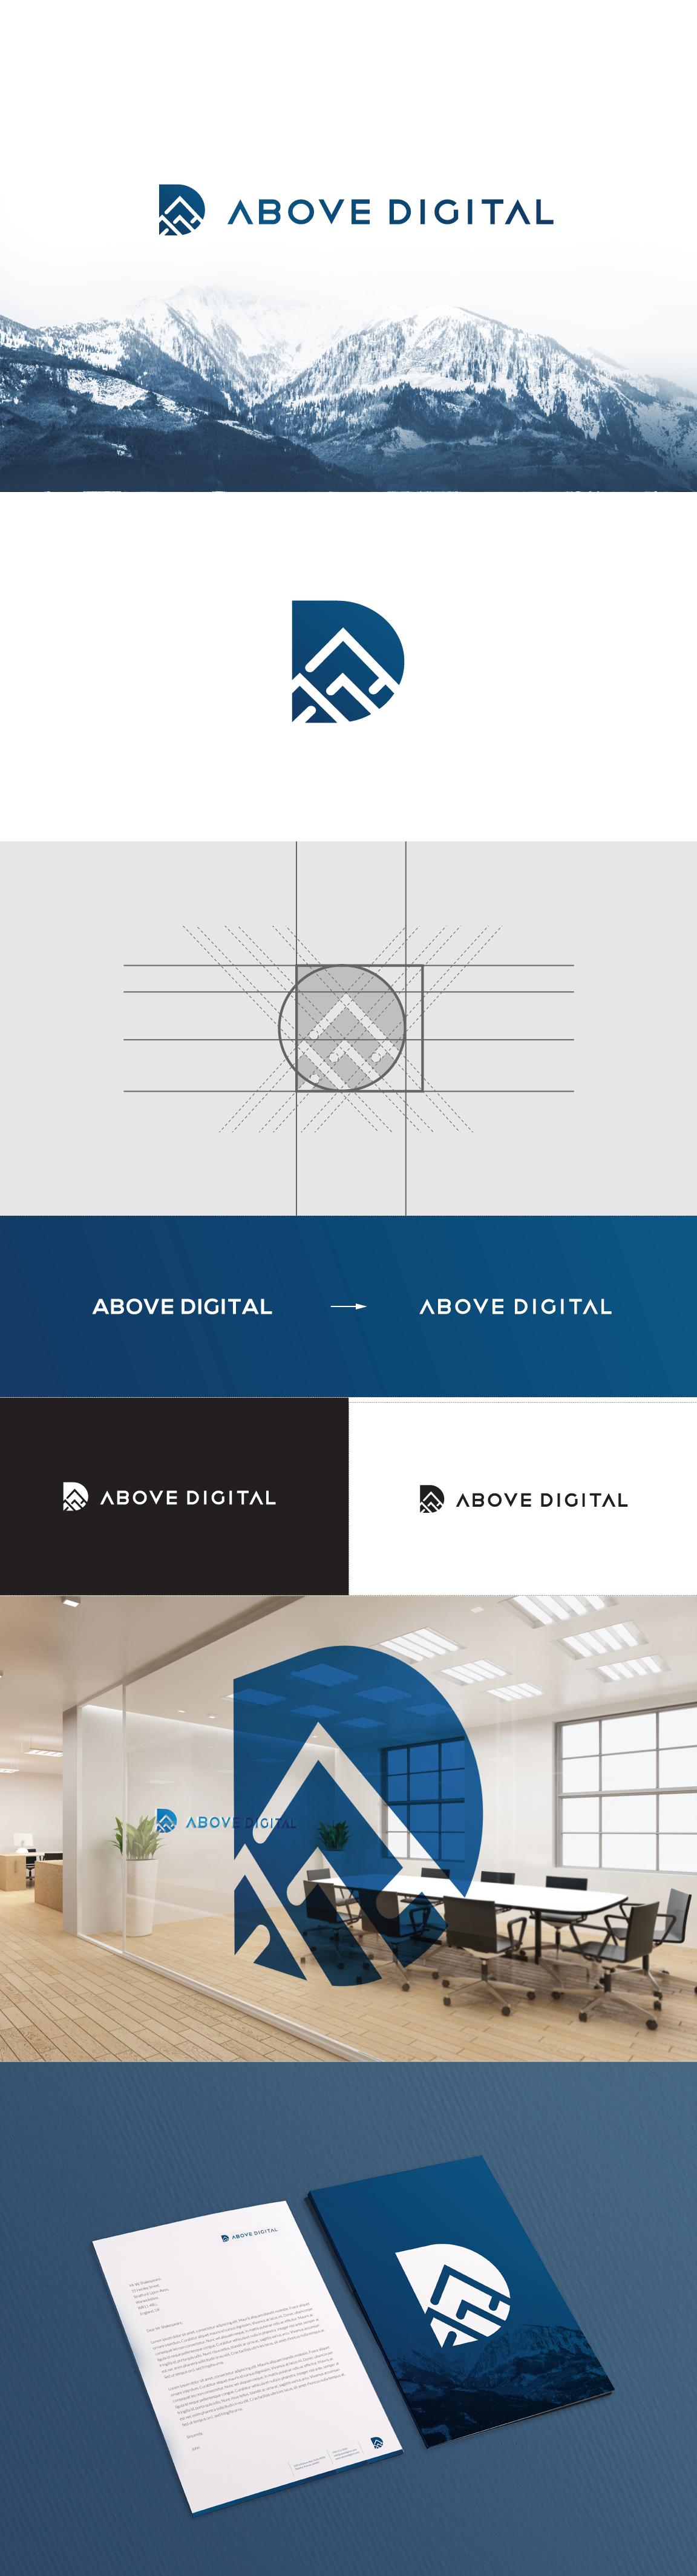 Above Digital Logo Design Branding Png By Tie A Tie Branding Design Logo Graphic Design Logo Logo Design